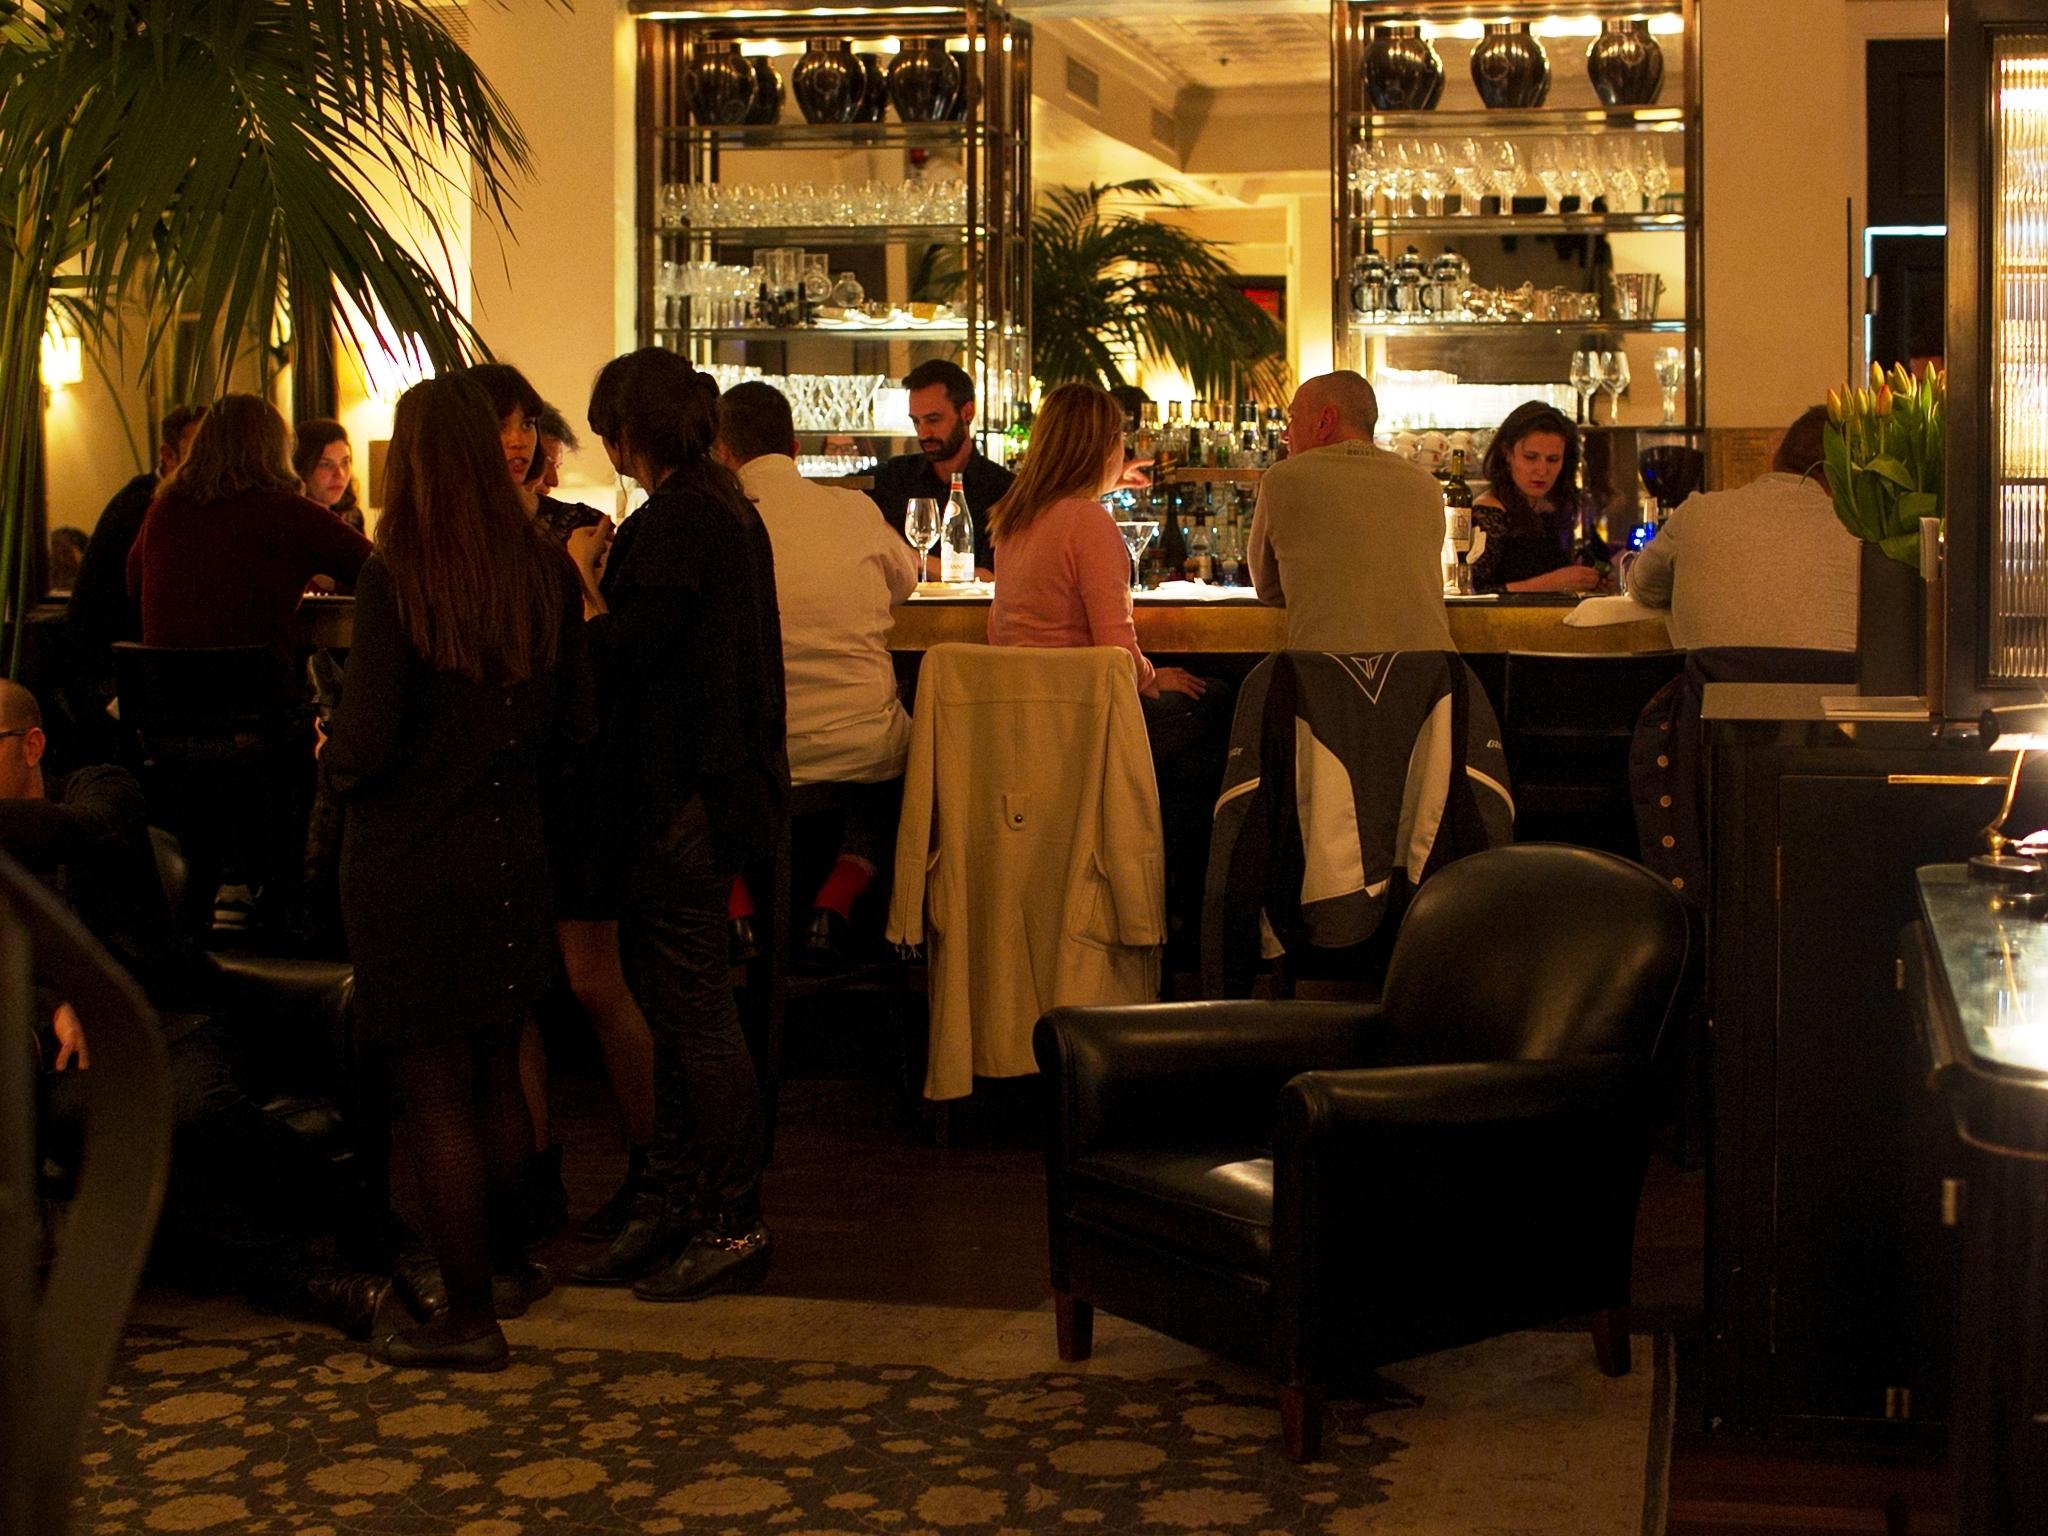 Hotel Montefiore Bar